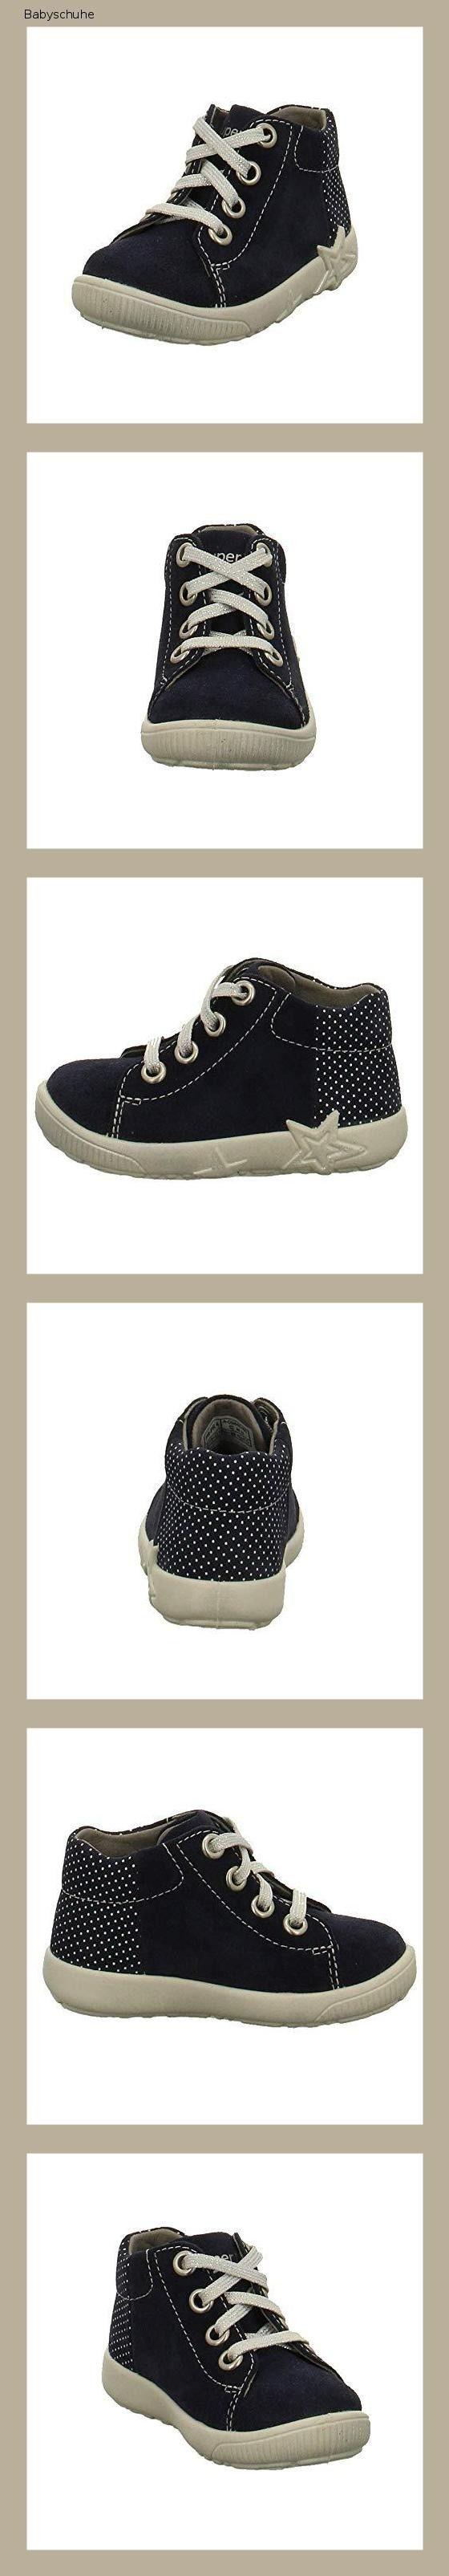 Superfit Baby Madchen Starlight Sneaker Madchen Babyschuhe Schuhe